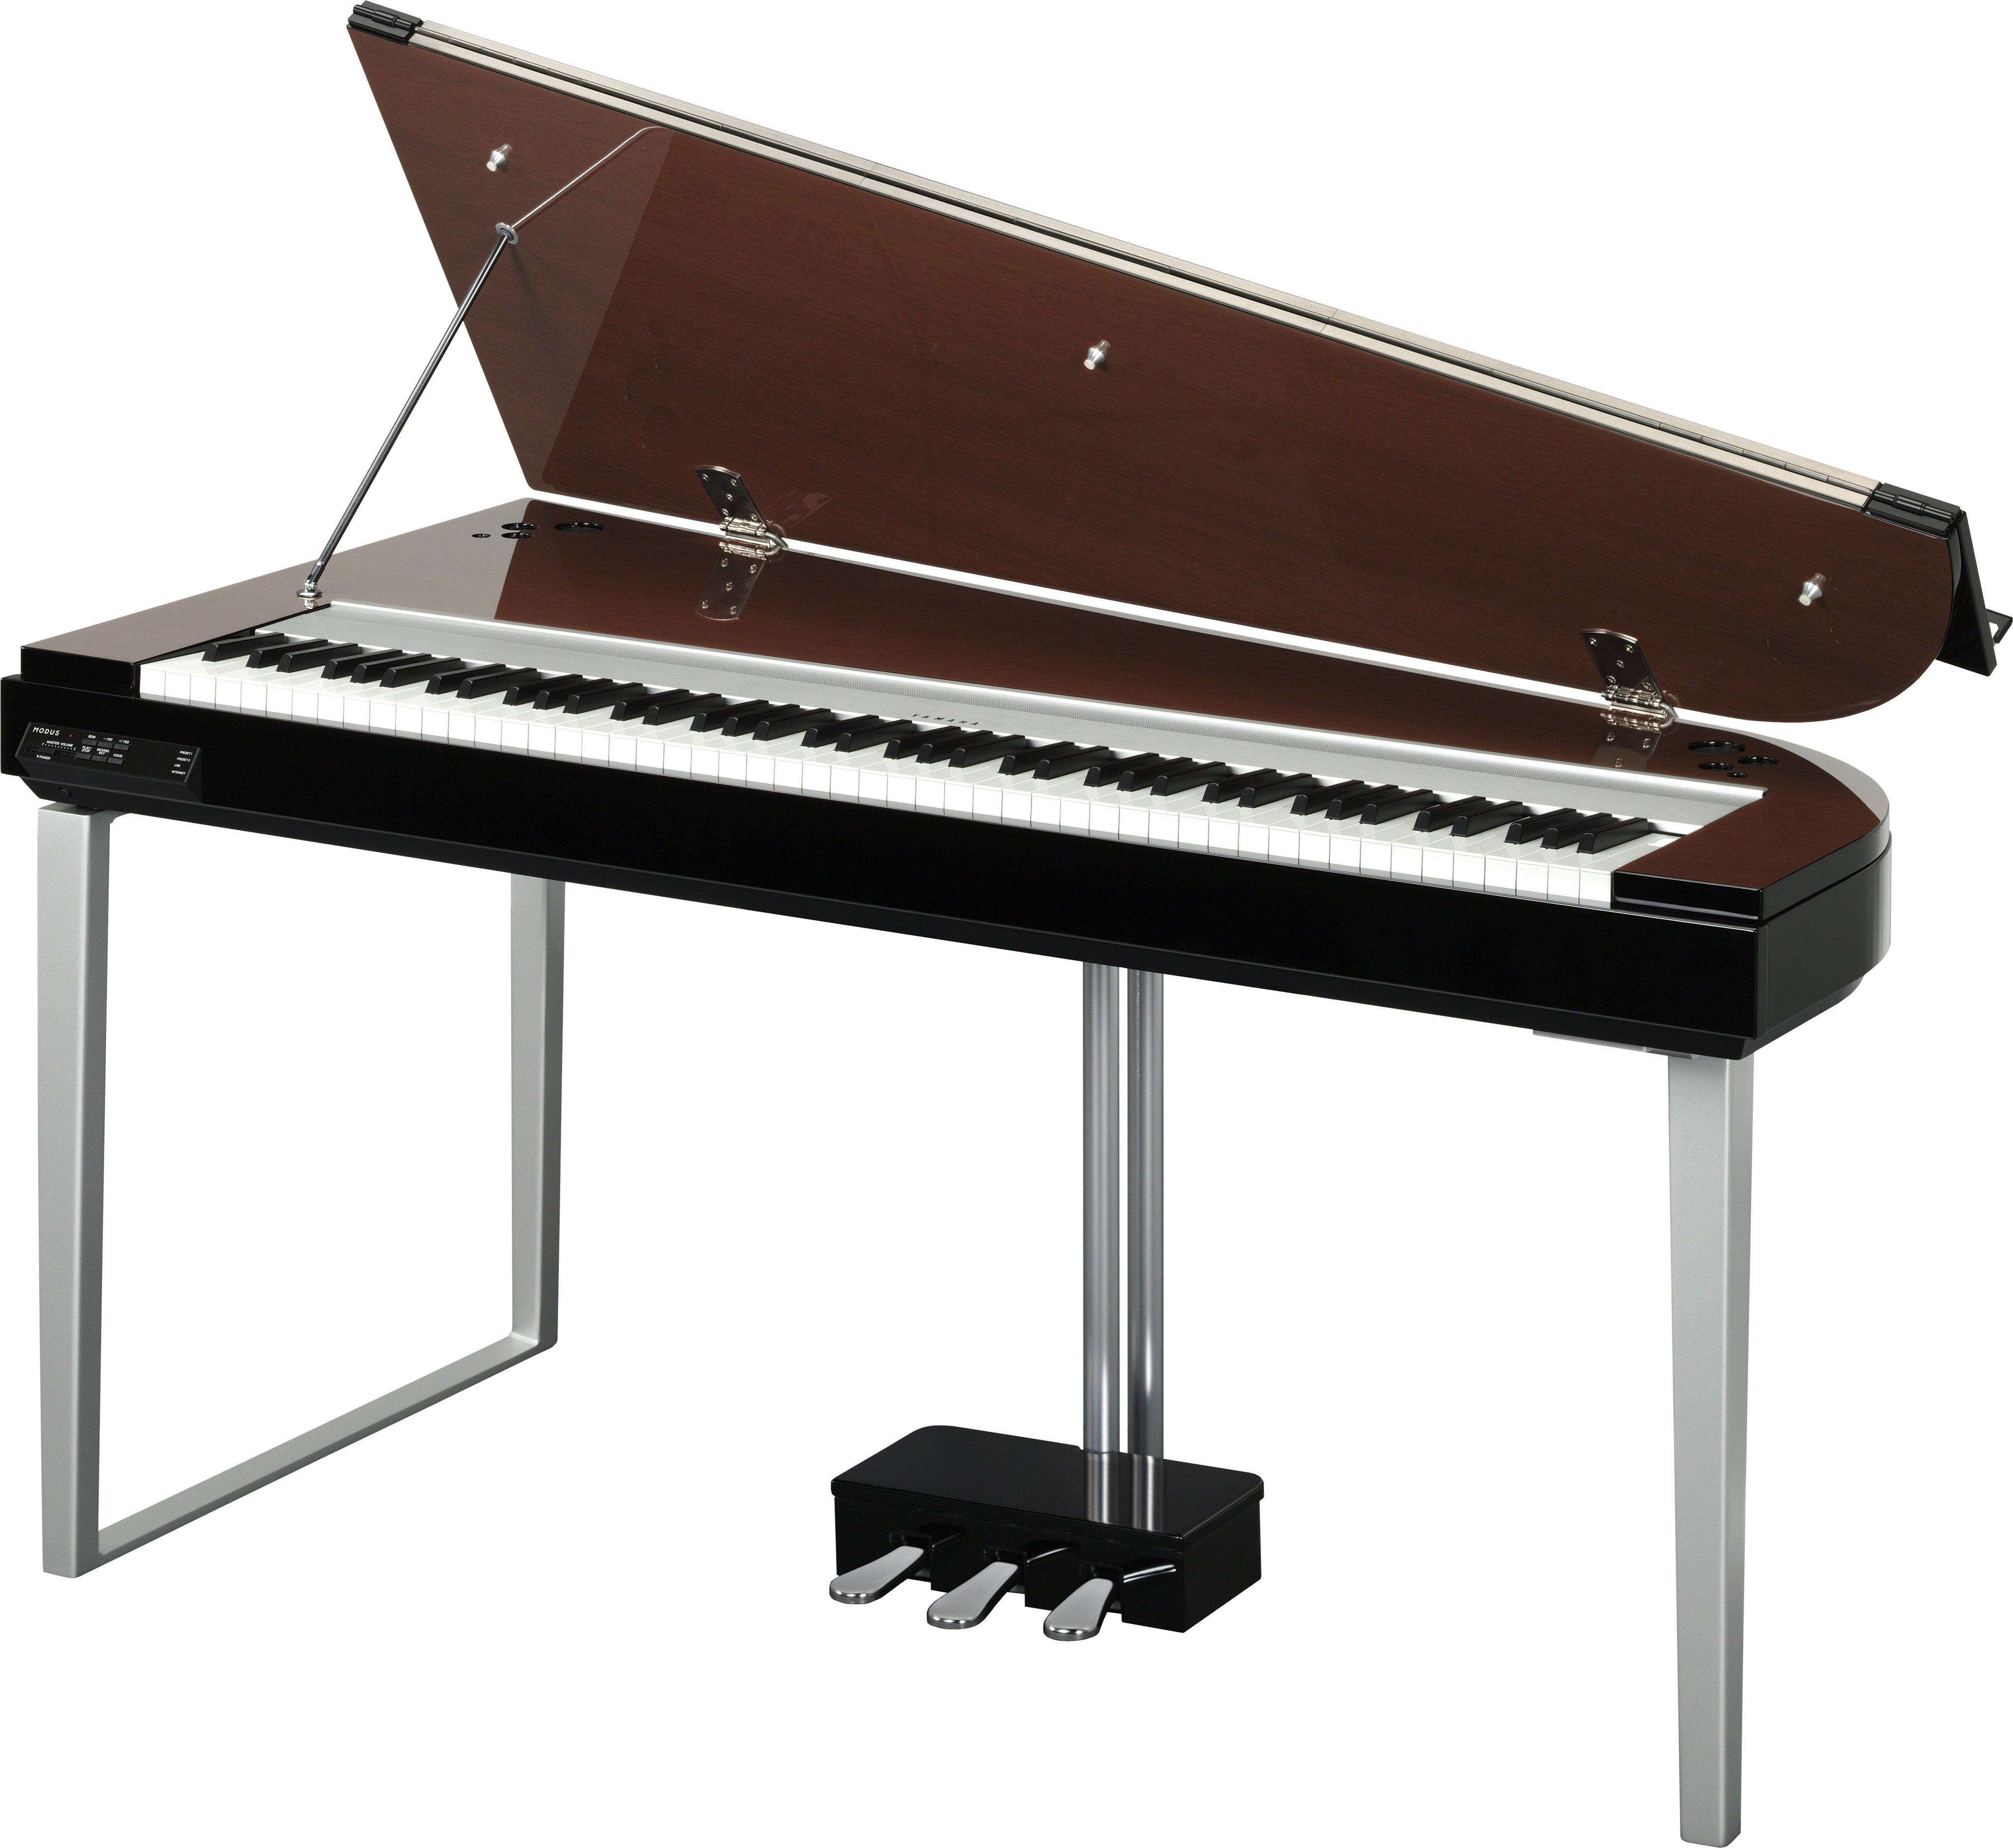 E Piano Yamaha : h11 overview modus series designer pianos pianos musical instruments products yamaha ~ Aude.kayakingforconservation.com Haus und Dekorationen